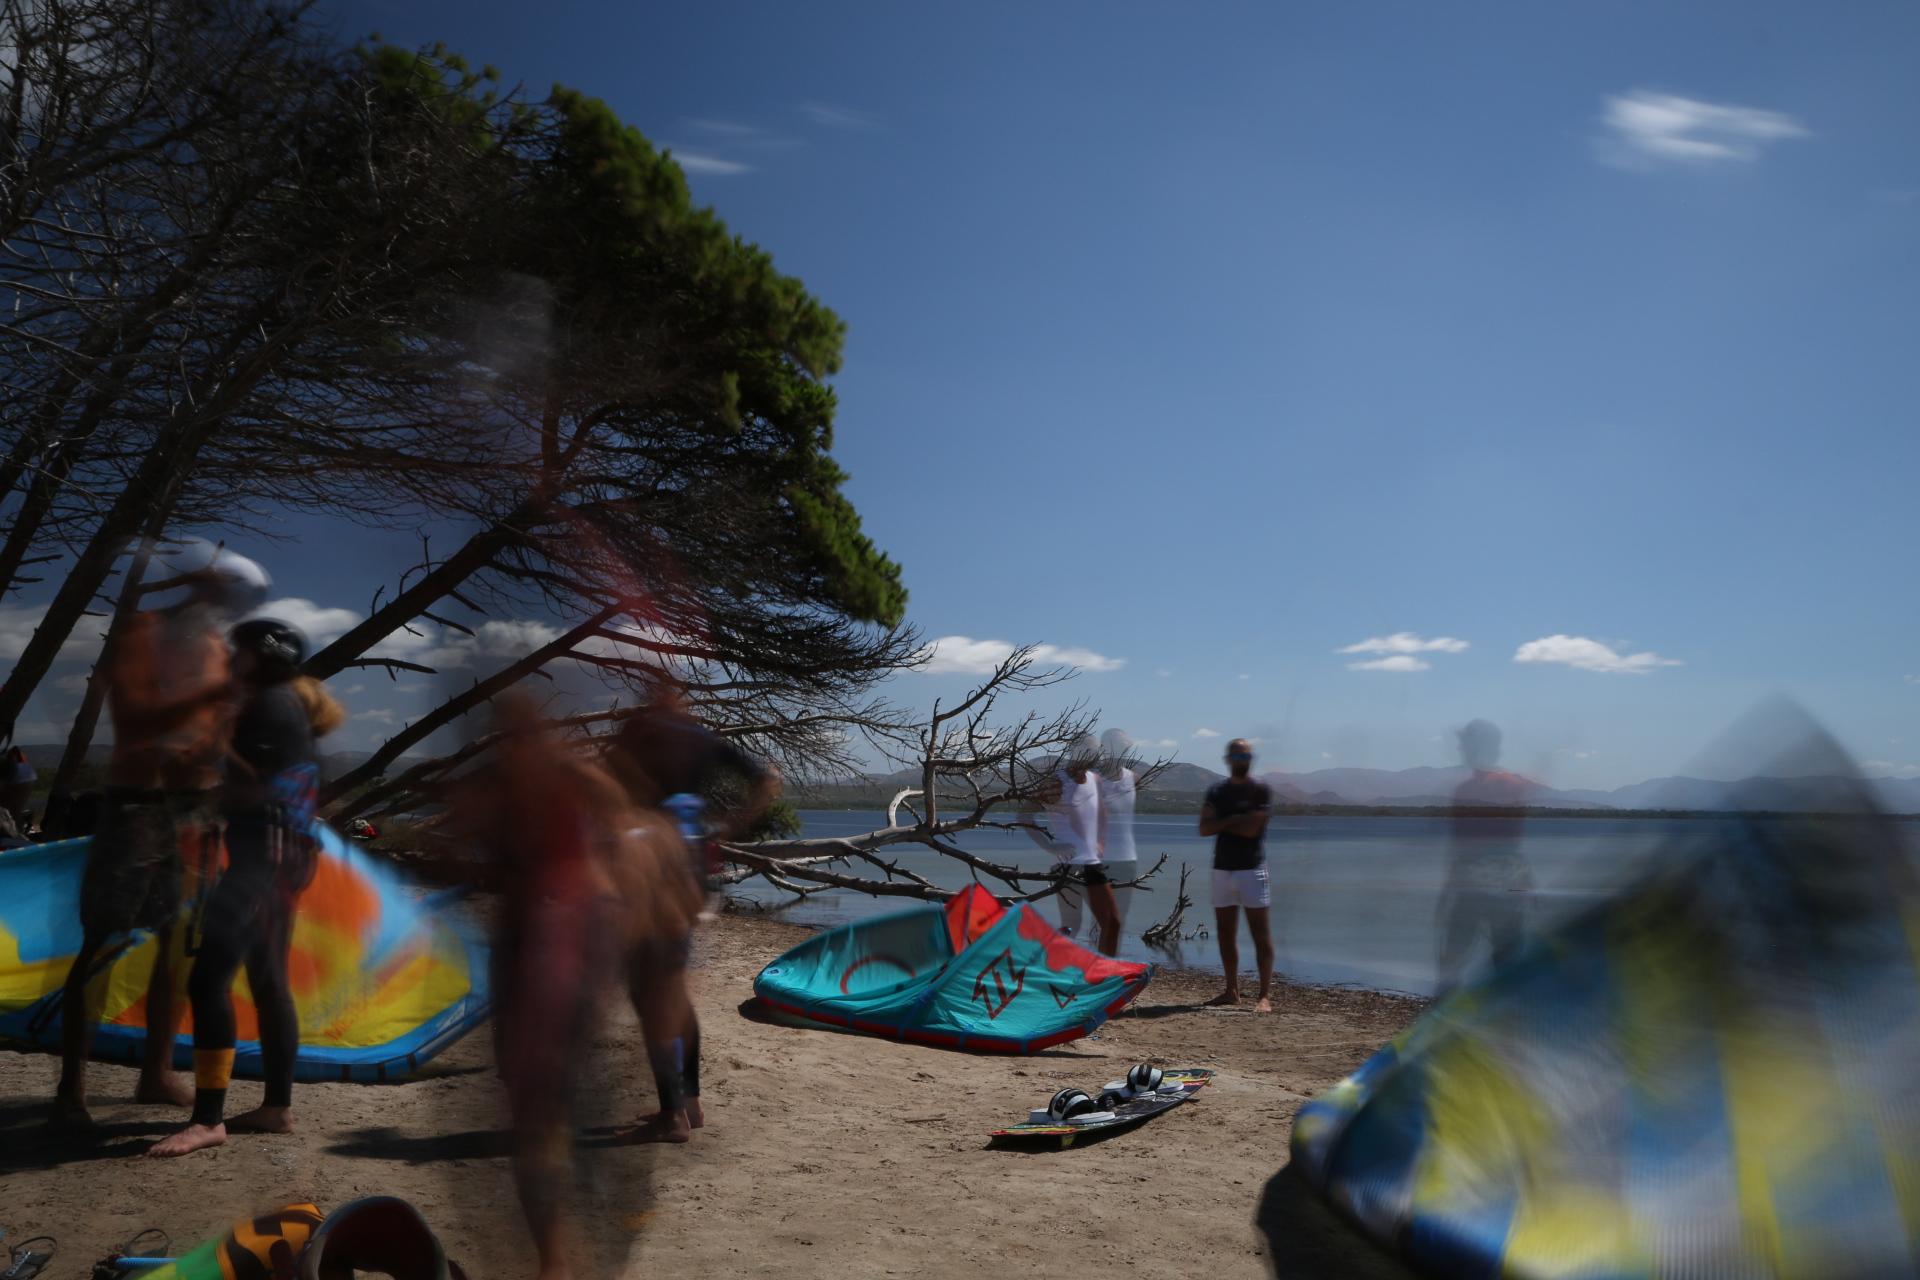 Meteo e Vento a Punta Trettu in Sardegna, il paradiso del kitesurf